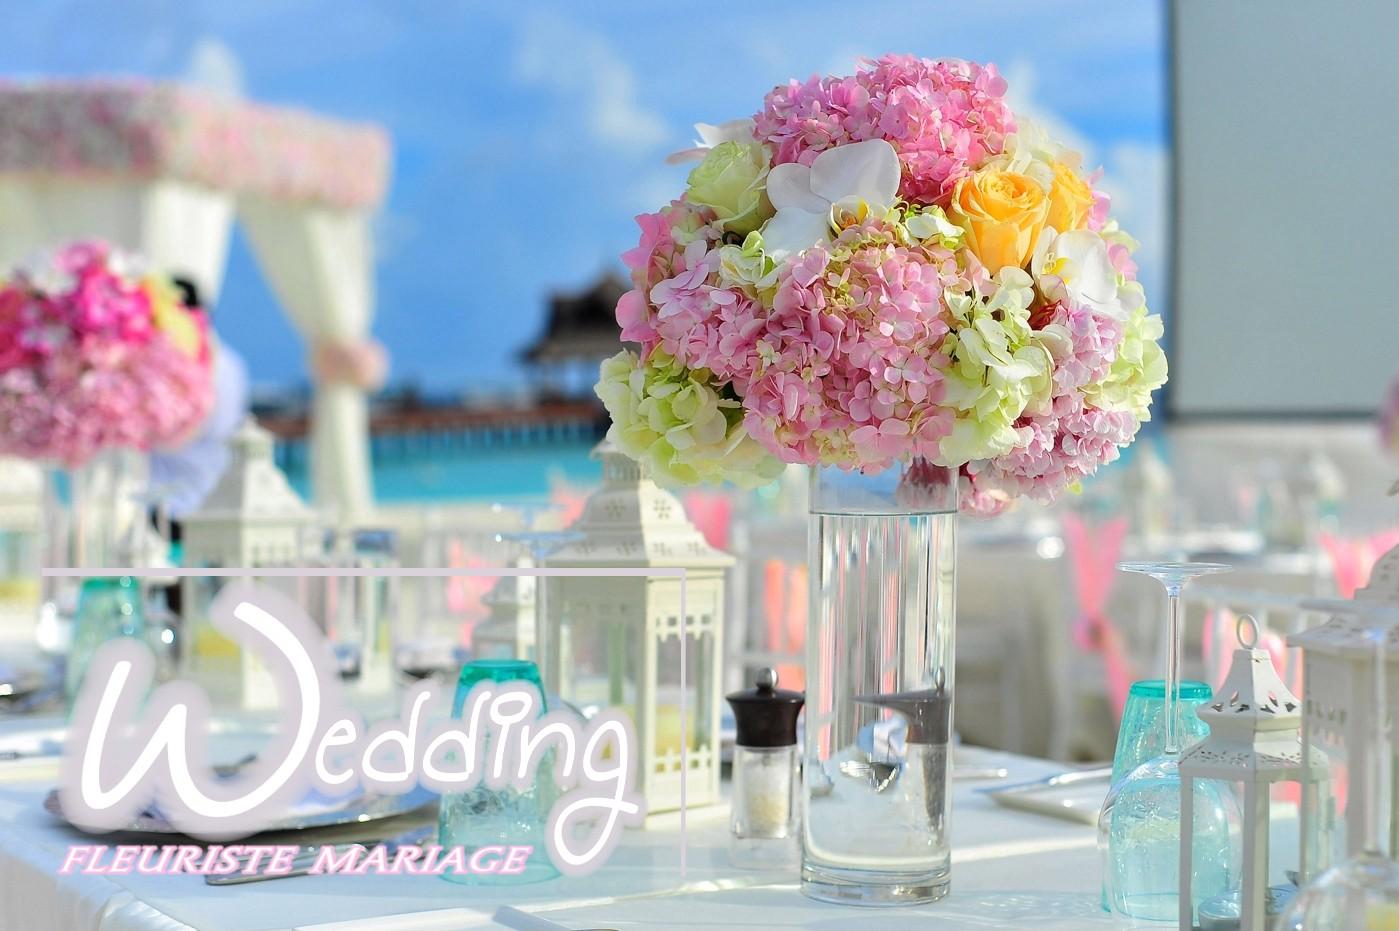 FLEURISTE POUR WEDDING PLANNERS - WEDDING PLANNERS - fleuriste mariage - FLEURISTE MARIAGE Aiglun ,WEDDING PLANNER Amirat ,WEDDING PLANNER Andon ,WEDDING PLANNER Antibes ,WEDDING PLANNER Ascros ,WEDDING PLANNER Aspremont ,WEDDING PLANNER Auribeau-sur-Siagne ,WEDDING PLANNER Auvare ,WEDDING PLANNER Bairols ,WEDDING PLANNER Beaulieu-sur-Mer ,WEDDING PLANNER Beausoleil ,WEDDING PLANNER Belvédère ,WEDDING PLANNER Bendejun ,WEDDING PLANNER Berre-les-Alpes ,WEDDING PLANNER Beuil ,WEDDING PLANNER Biot ,WEDDING PLANNER Blausasc ,WEDDING PLANNER Bonson ,WEDDING PLANNER Bouyon ,WEDDING PLANNER Breil-sur-Roya ,WEDDING PLANNER Briançonnet ,WEDDING PLANNER Bézaudun-les-Alpes ,WEDDING PLANNER Cabris ,WEDDING PLANNER Cagnes-sur-Mer ,WEDDING PLANNER Caille ,WEDDING PLANNER Cannes ,WEDDING PLANNER Cannes la bocca ,WEDDING PLANNER Cantaron ,WEDDING PLANNER Cap-d'Ail ,WEDDING PLANNER Carnoles - Roquebrune-Cap-Martin ,WEDDING PLANNER Carros ,WEDDING PLANNER Castagniers ,WEDDING PLANNER Castellar ,WEDDING PLANNER Castillon ,WEDDING PLANNER Caussols ,WEDDING PLANNER Châteauneuf-d'Entraunes ,WEDDING PLANNER Châteauneuf-Grasse ,WEDDING PLANNER Châteauneuf-Villevieille ,WEDDING PLANNER Cipières ,WEDDING PLANNER Clans ,WEDDING PLANNER Coaraze ,WEDDING PLANNER Collongues ,WEDDING PLANNER Colomars ,WEDDING PLANNER Conségudes ,WEDDING PLANNER Contes ,WEDDING PLANNER Courmes ,WEDDING PLANNER Coursegoules ,WEDDING PLANNER Cuébris ,WEDDING PLANNER Daluis ,WEDDING PLANNER Drap ,WEDDING PLANNER Duranus ,WEDDING PLANNER Entraunes ,WEDDING PLANNER Escragnolles ,WEDDING PLANNER Èze ,WEDDING PLANNER Falicon ,WEDDING PLANNER Fontan ,WEDDING PLANNER Gars ,WEDDING PLANNER Gattières ,WEDDING PLANNER Gilette ,WEDDING PLANNER Gorbio ,WEDDING PLANNER Gourdon ,WEDDING PLANNER Grasse ,WEDDING PLANNER Gréolières ,WEDDING PLANNER Guillaumes ,WEDDING PLANNER Ilonse ,WEDDING PLANNER Isola ,WEDDING PLANNER L' Escarène ,WEDDING PLANNER La Bollène-Vésubie ,WEDDING PLANNER La Brigue ,WEDDING PLANNER La Colle-sur-Loup ,W